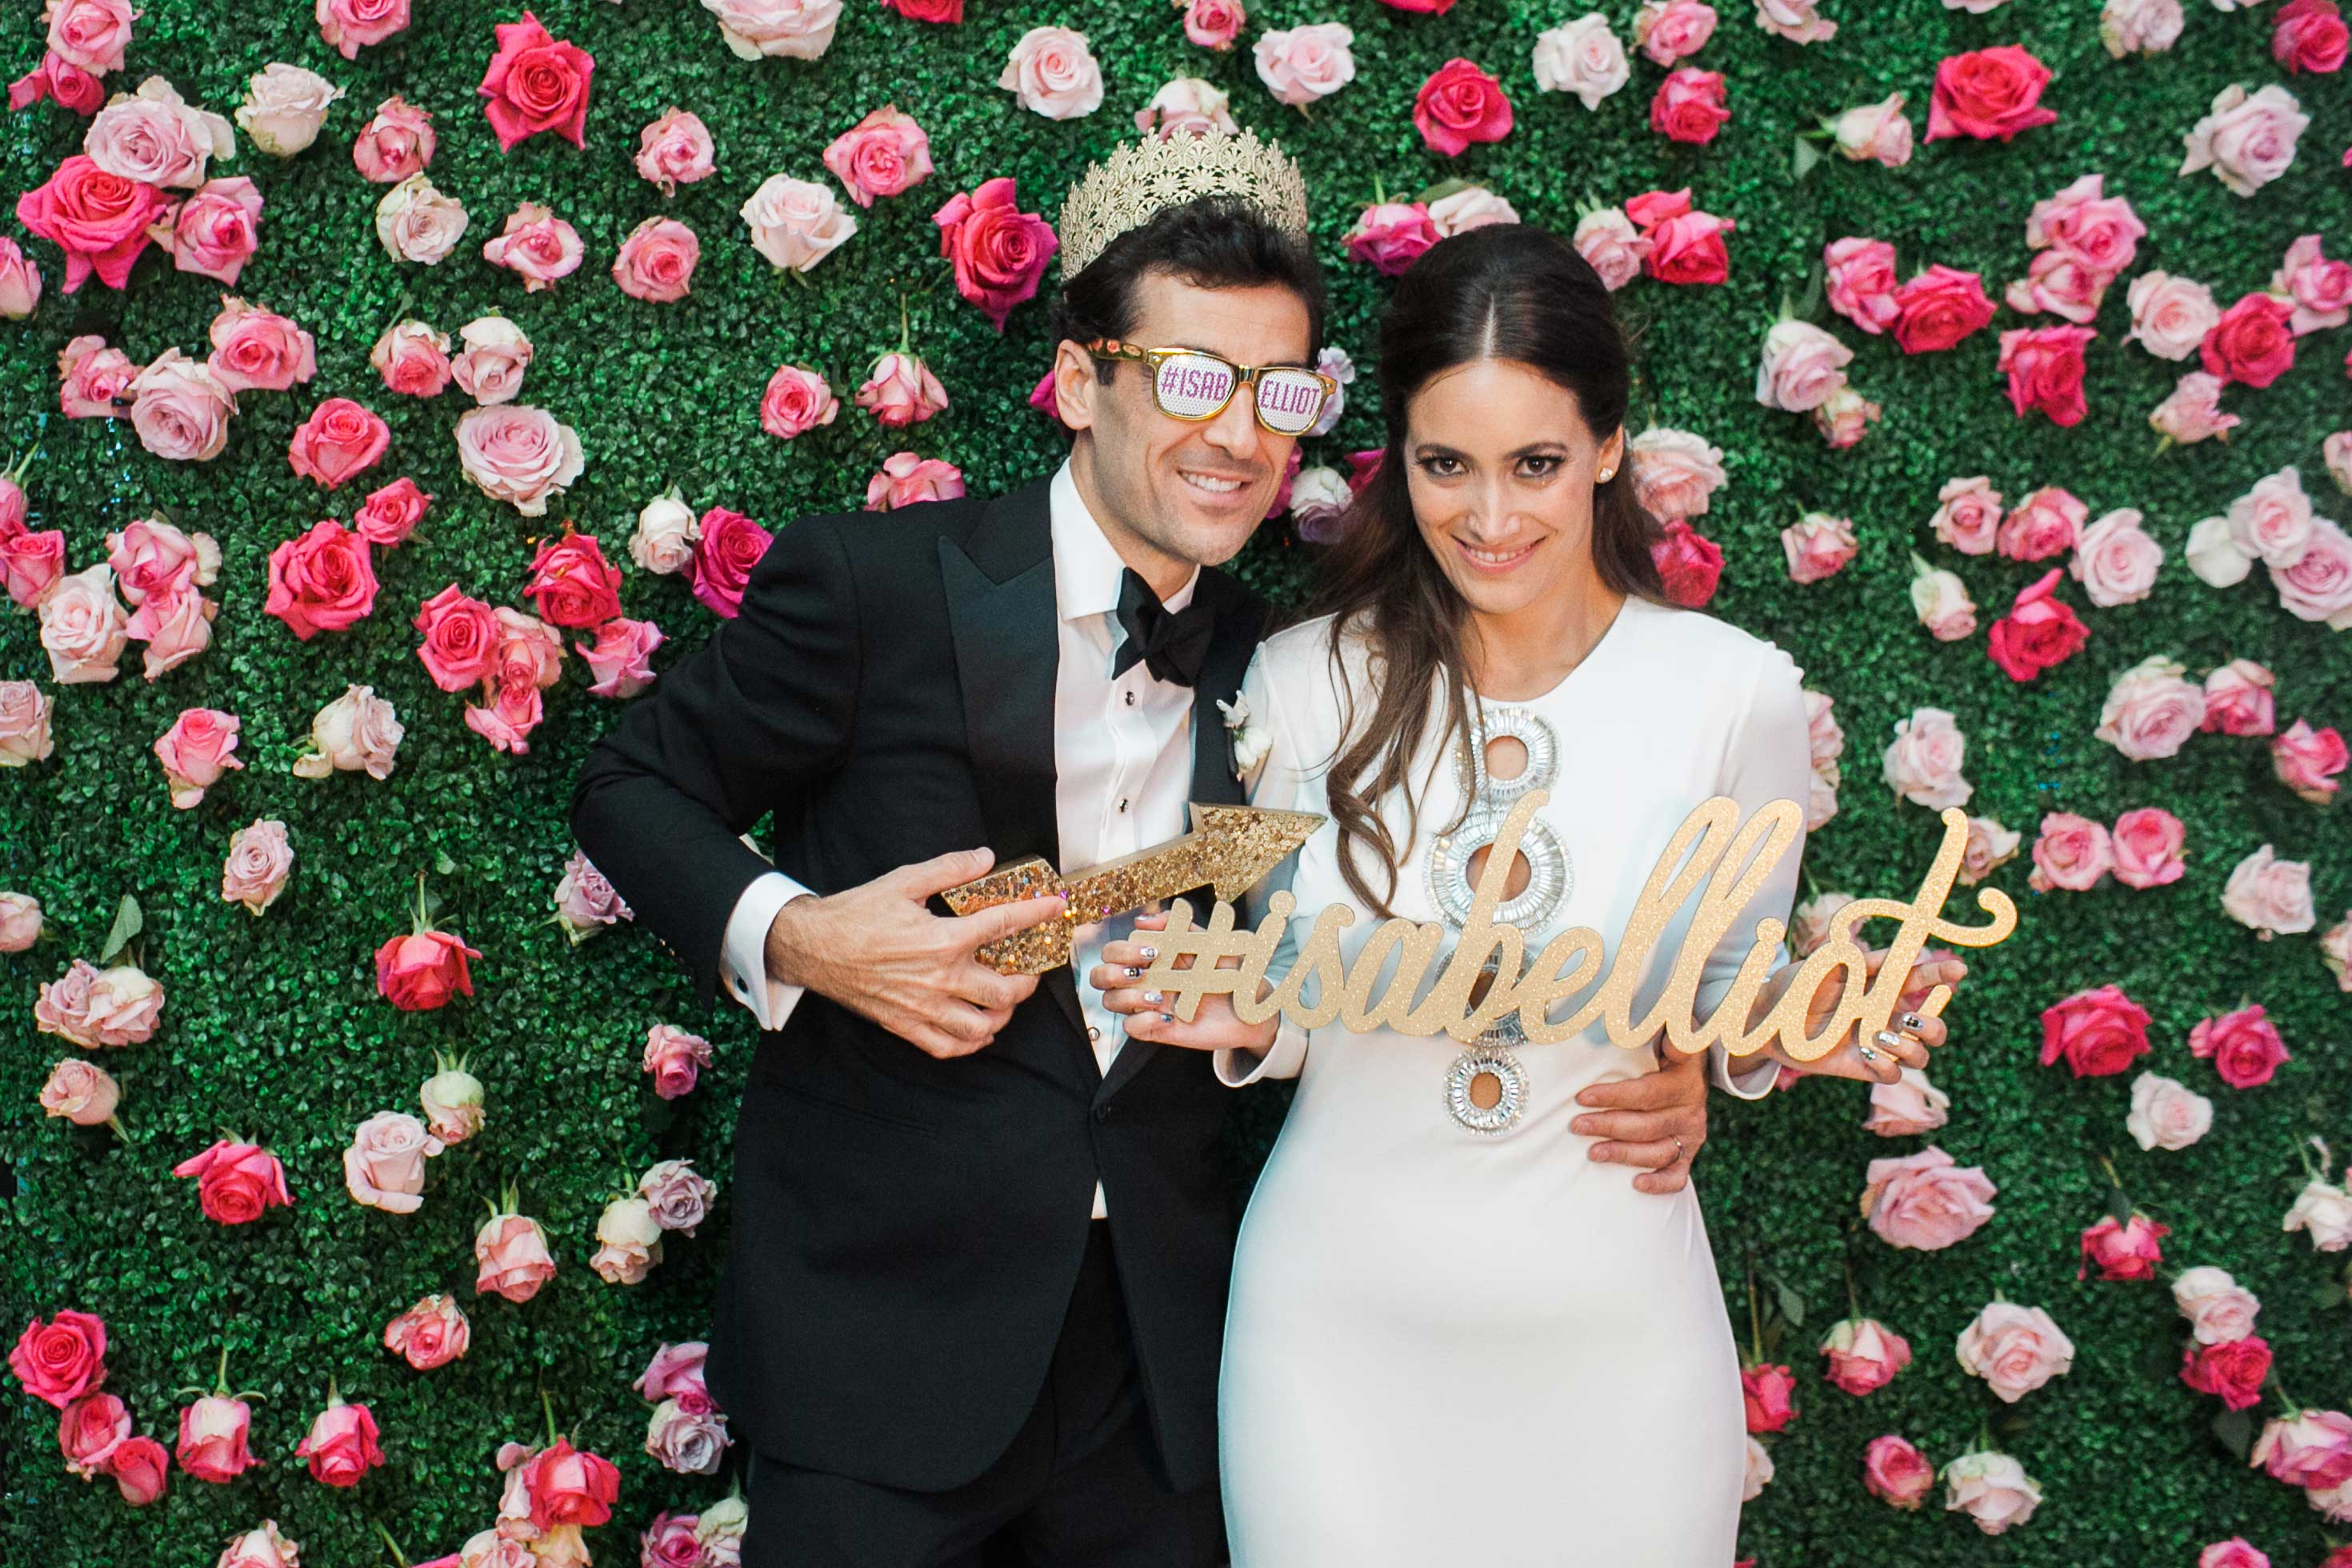 laser cut wedding ideas laser-cut wedding name photo booth prop reception